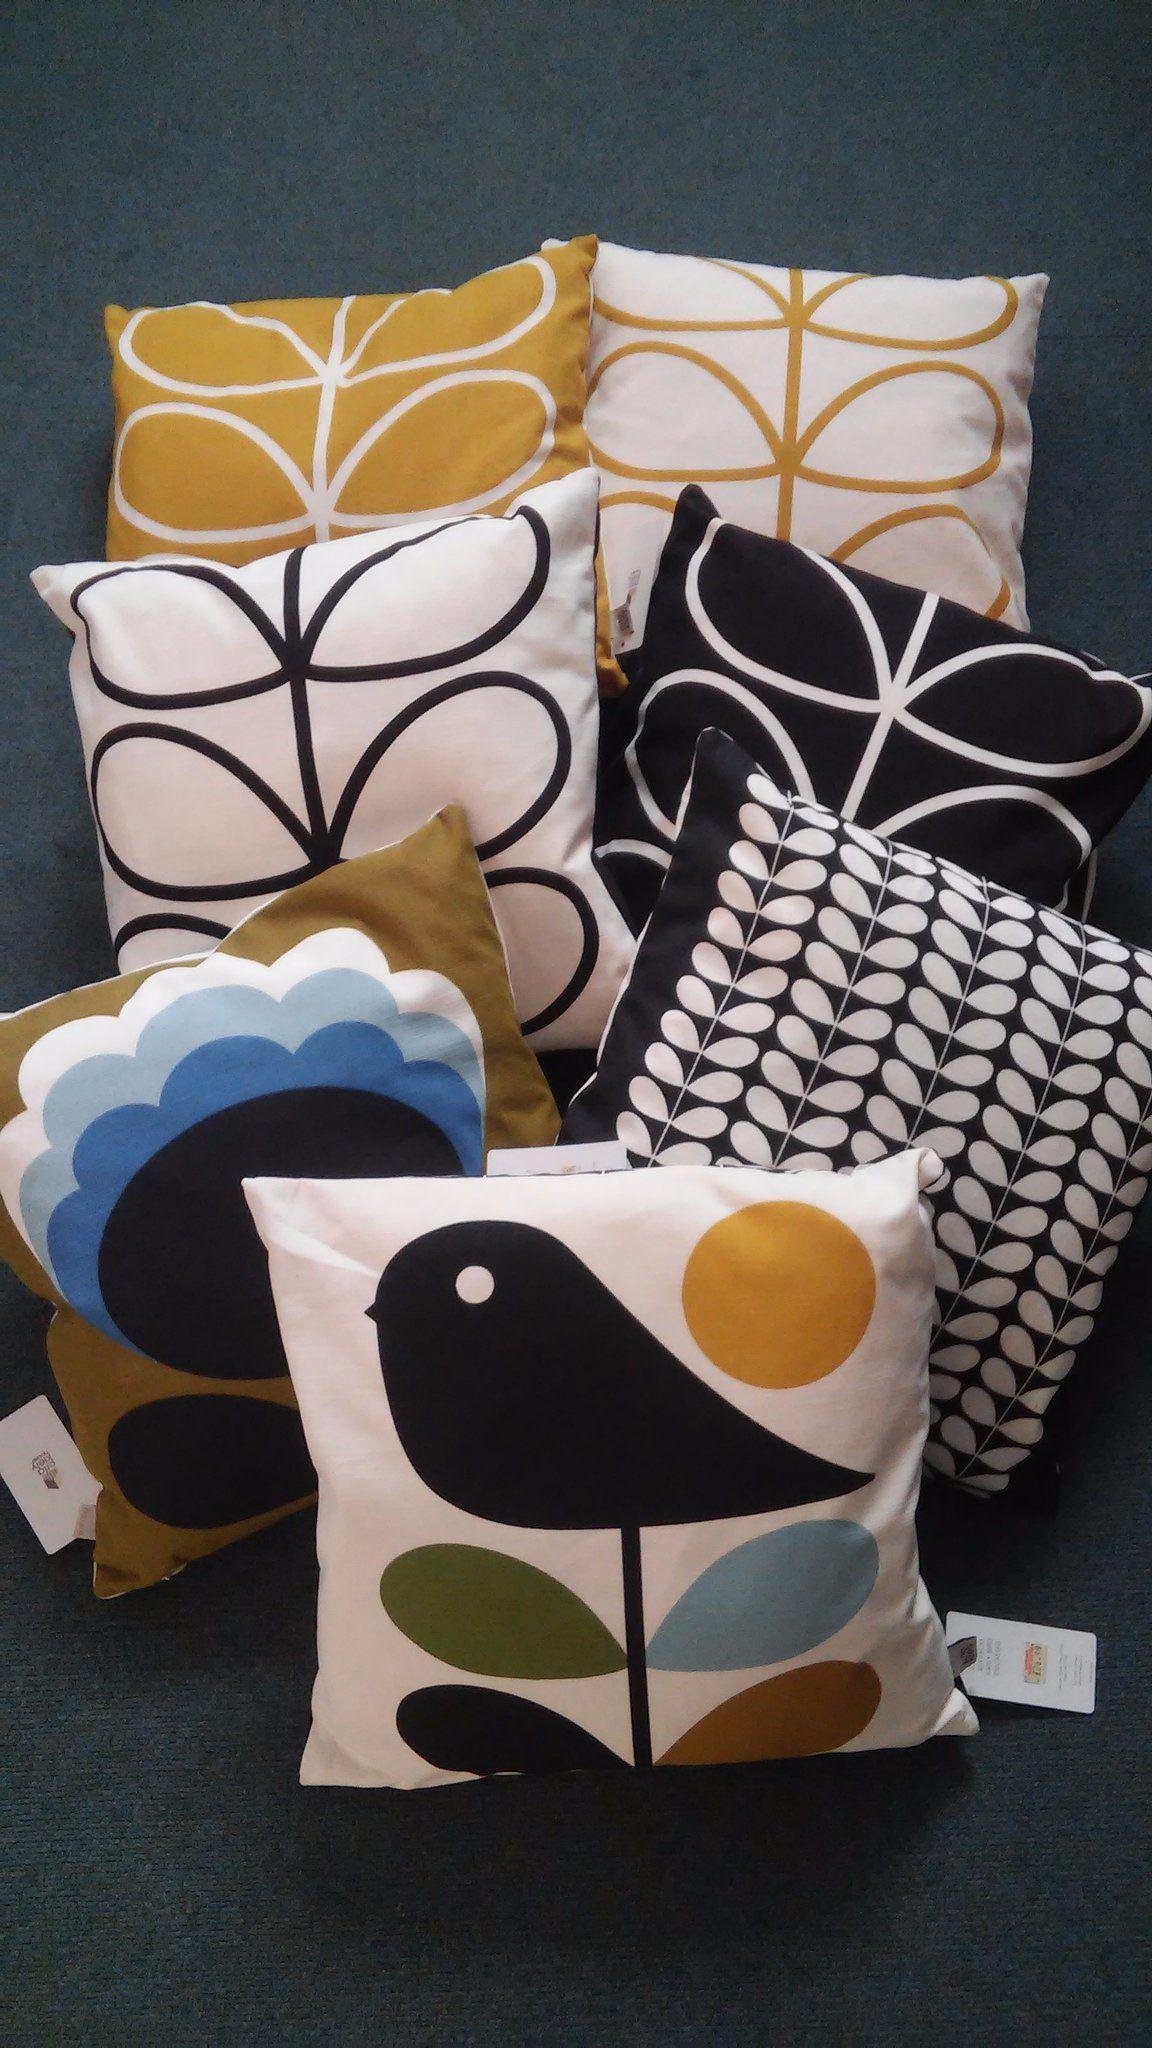 Orla Kiely Cushions in Gardiner Haskins home furnishings | Home ...